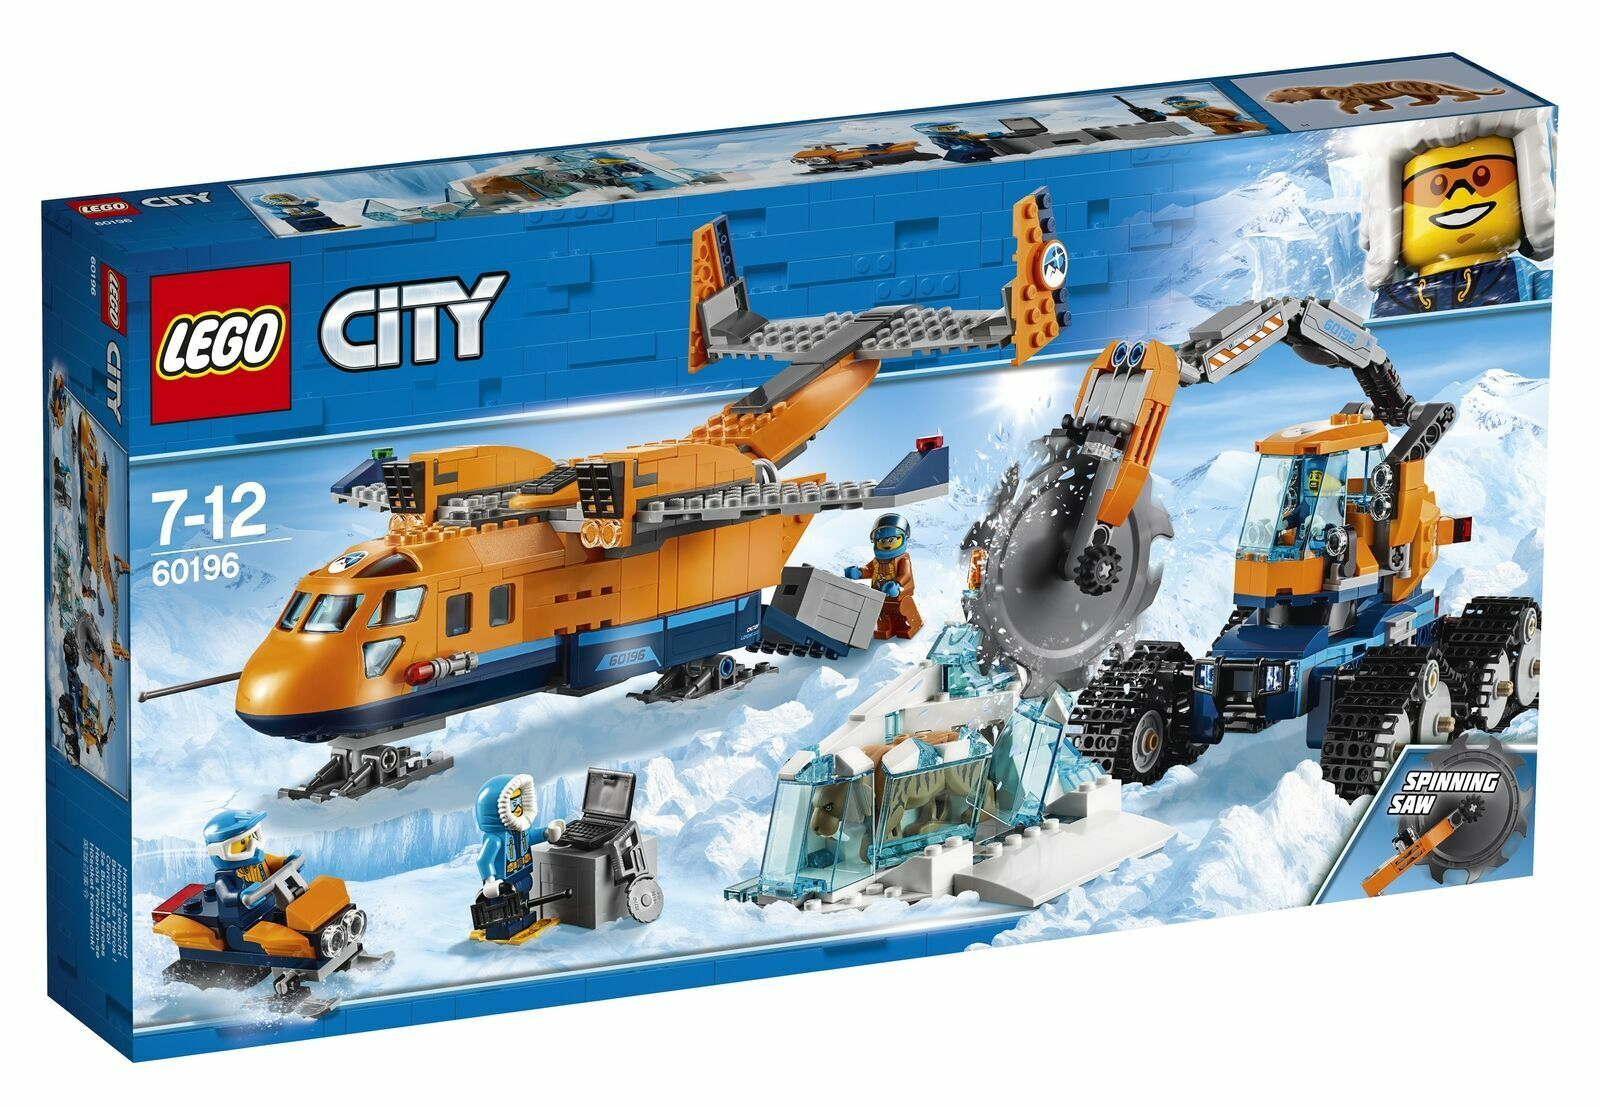 Lego CITY PLANO de suministro Ártico (60196)